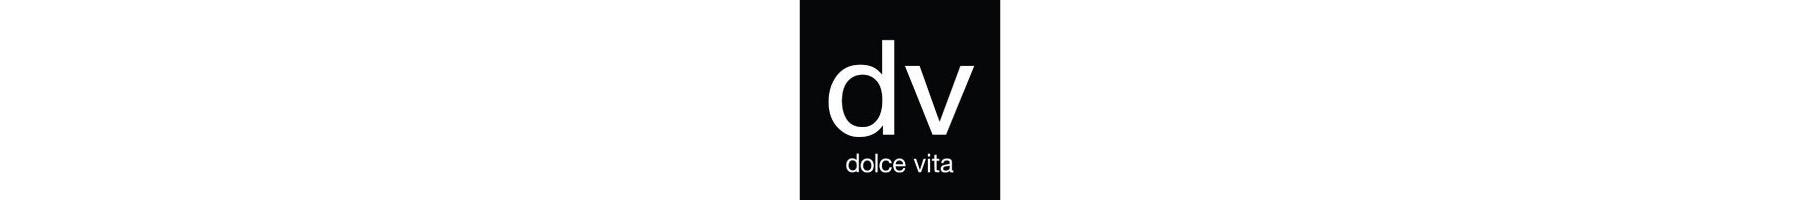 DrJays.com - DV by Dolce Vita